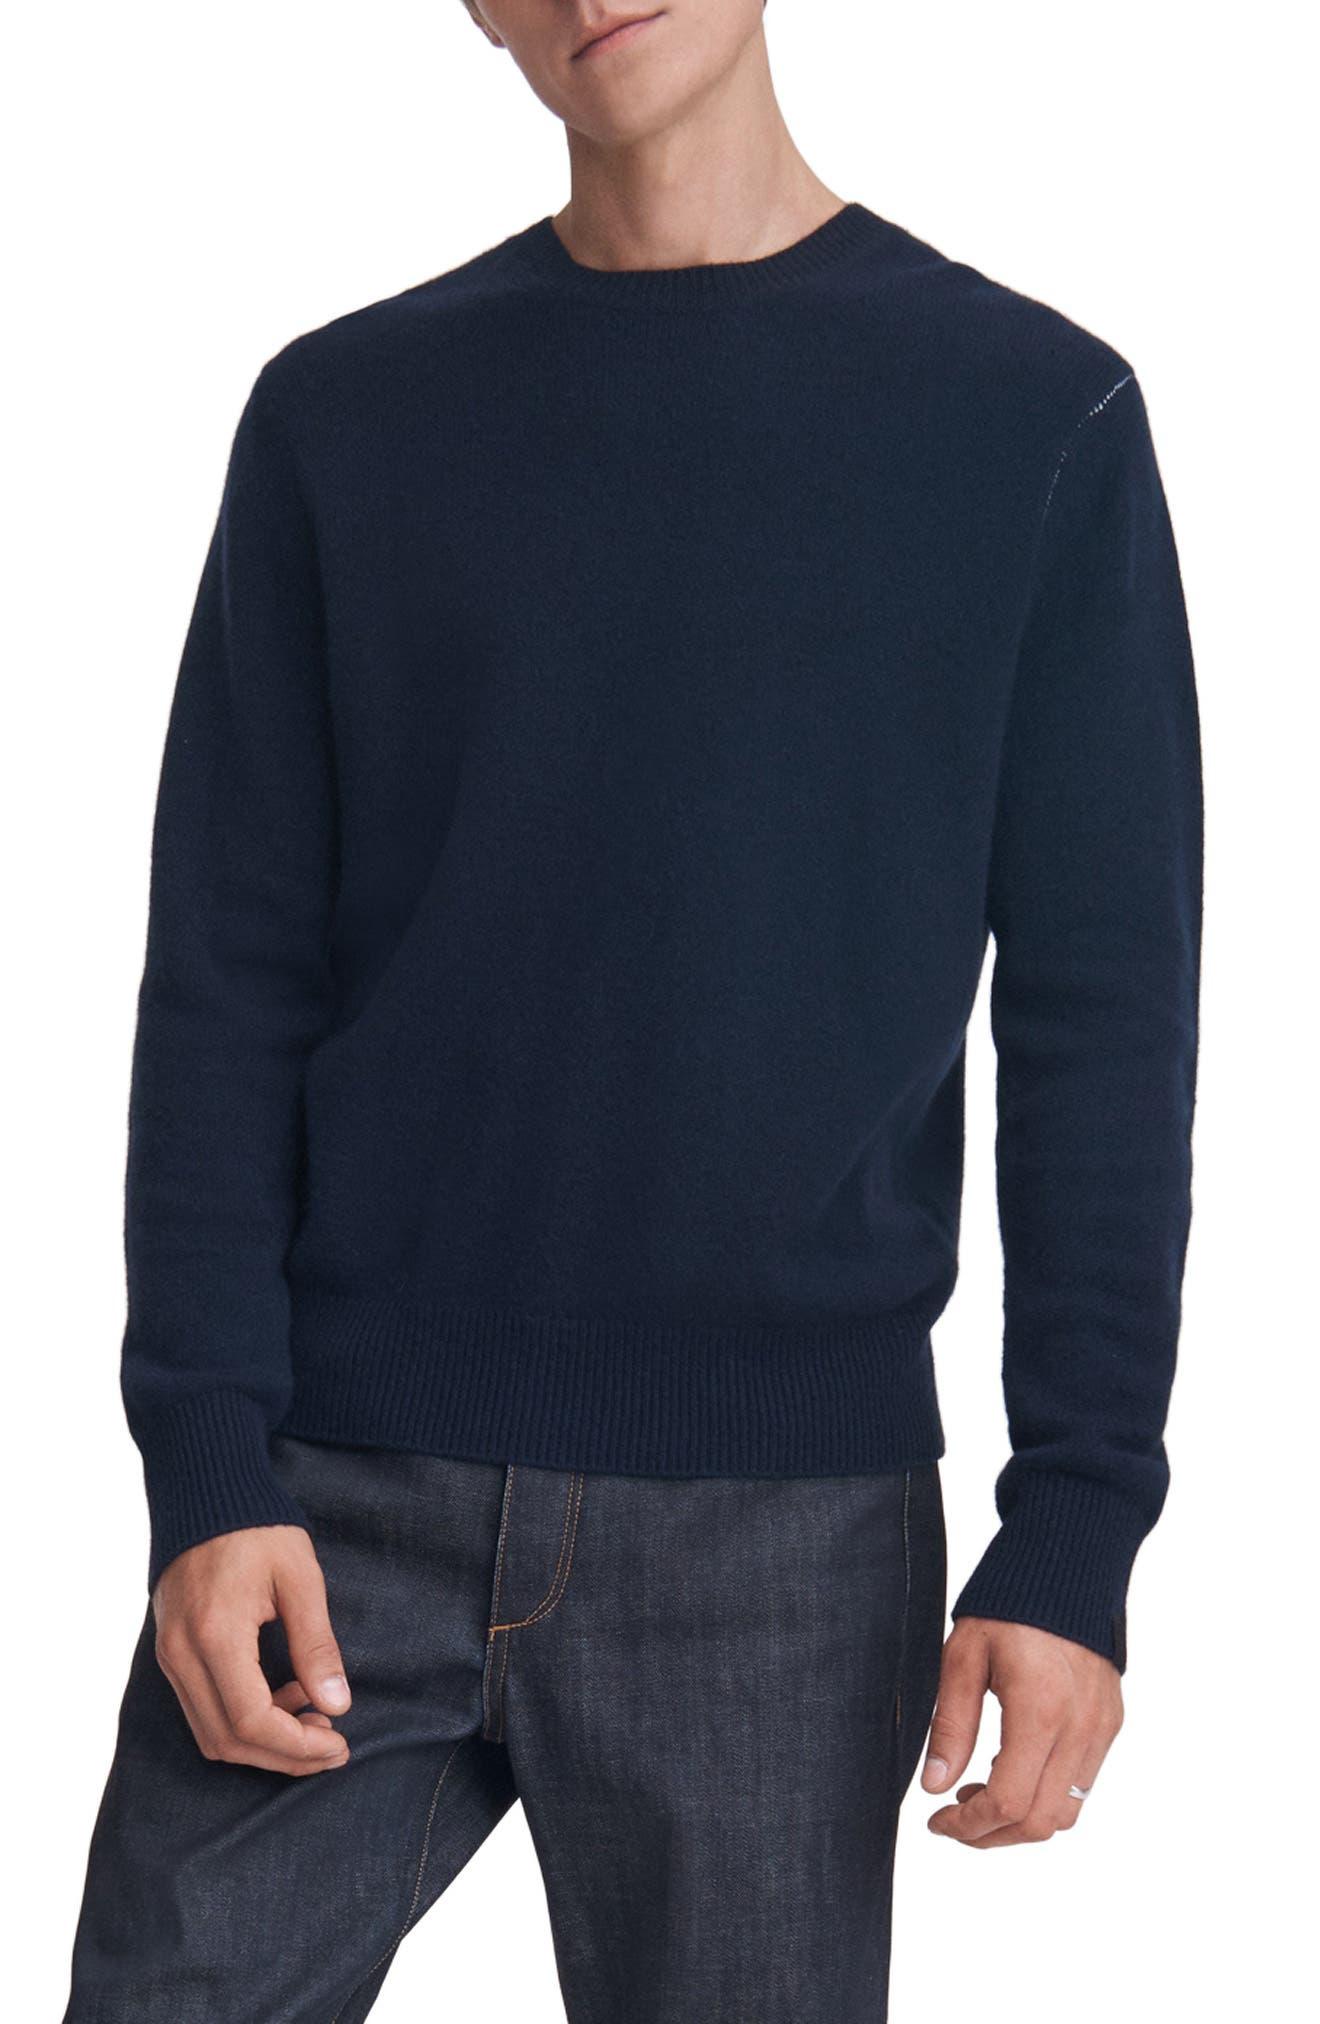 Image of Rag & Bone Haldon Cashmere Crewneck Sweater